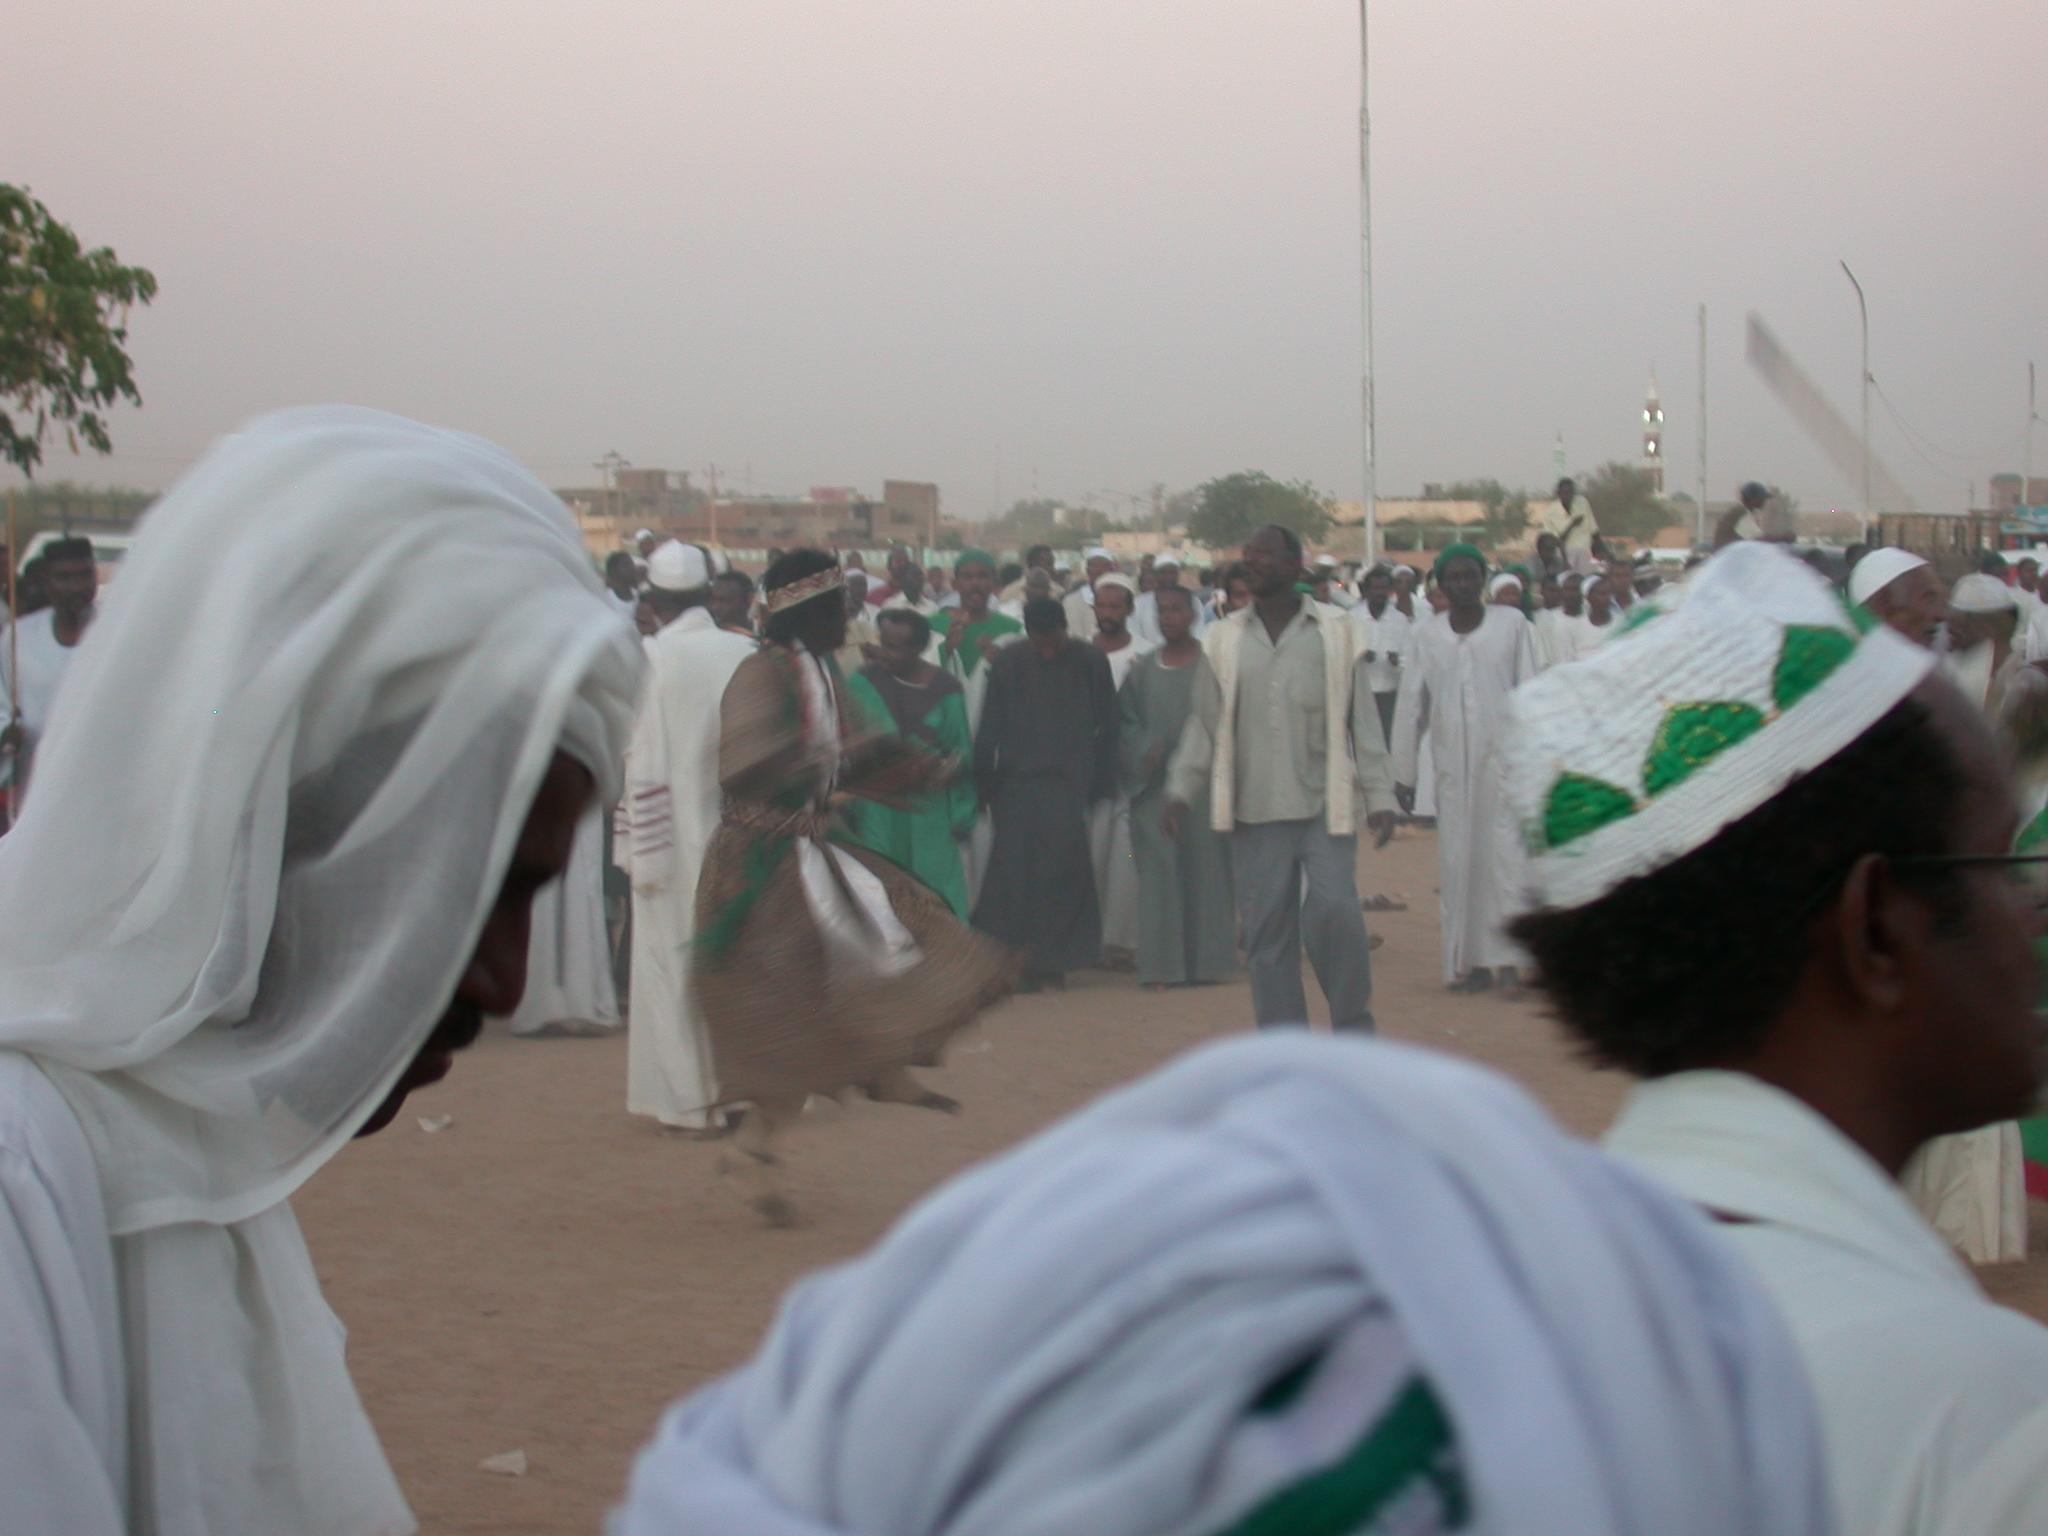 Sufi Dancing, Omdurman, Sudan